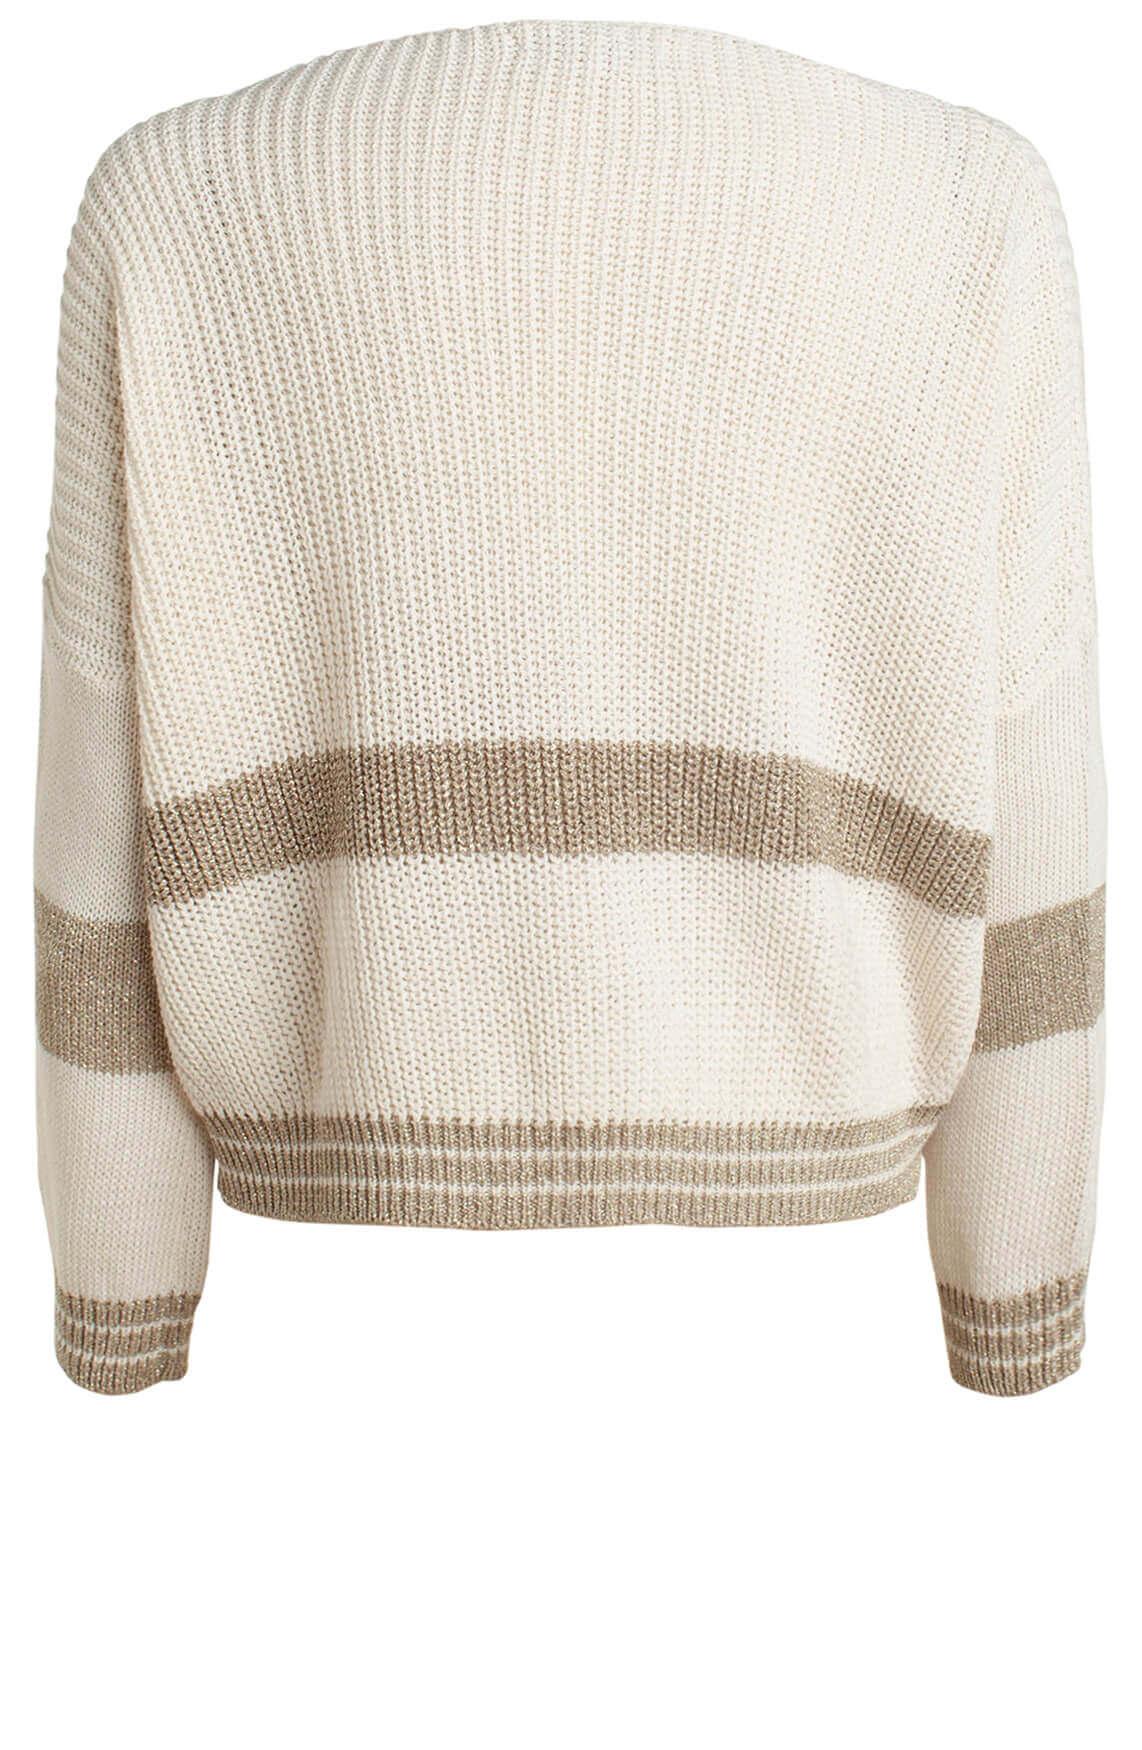 La Fée Maraboutée Dames Pullover met lurex streep wit